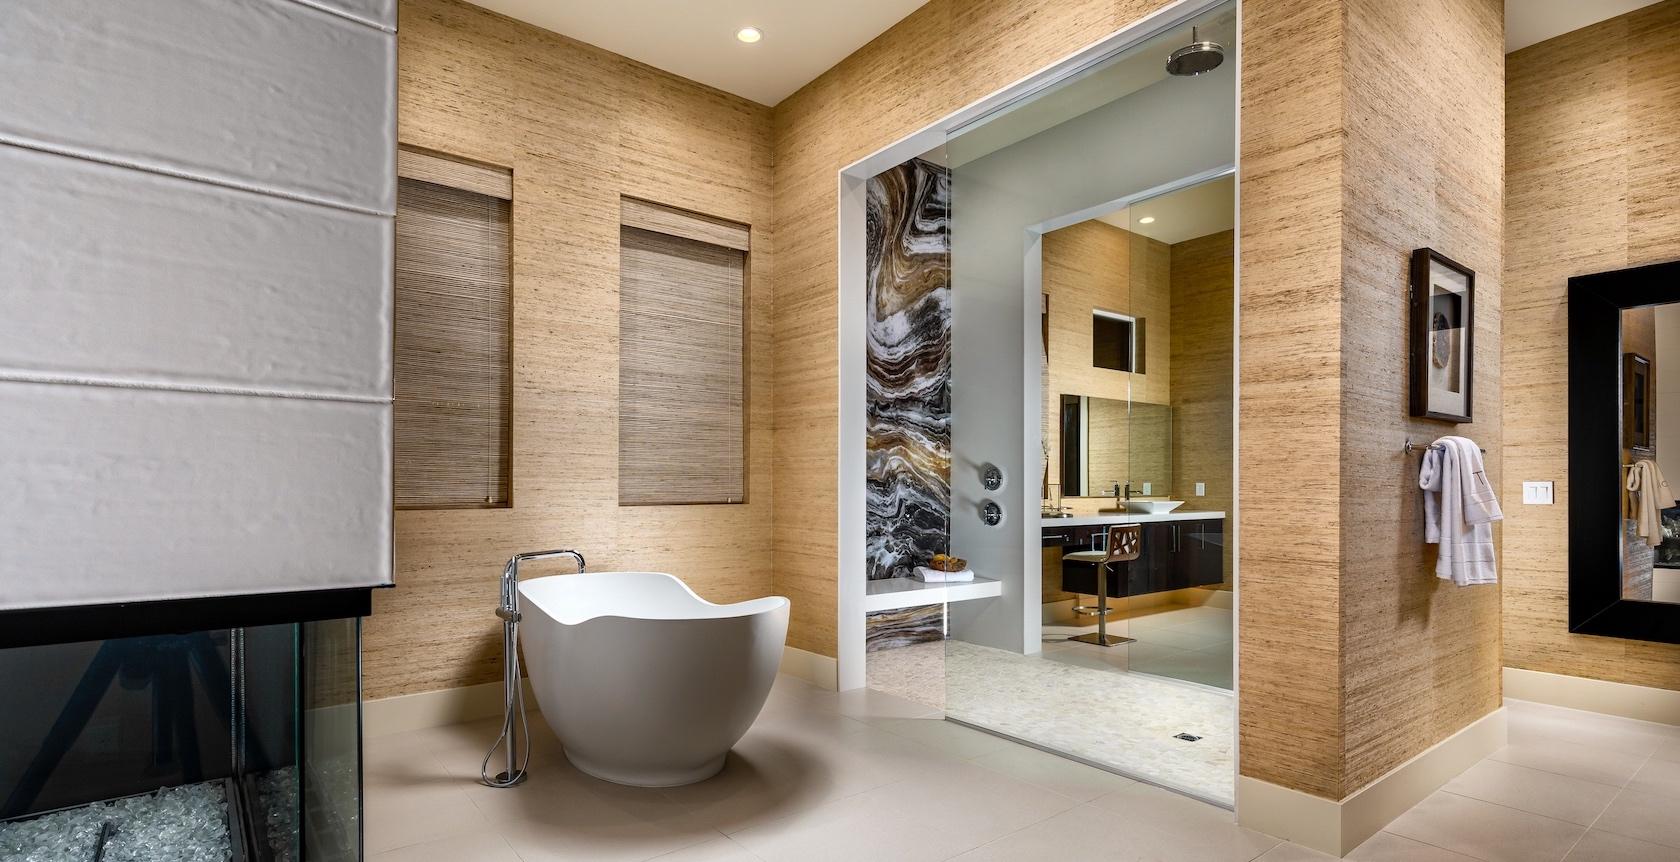 Spa-Like Master Bathroom With a Freestanding Bathtub